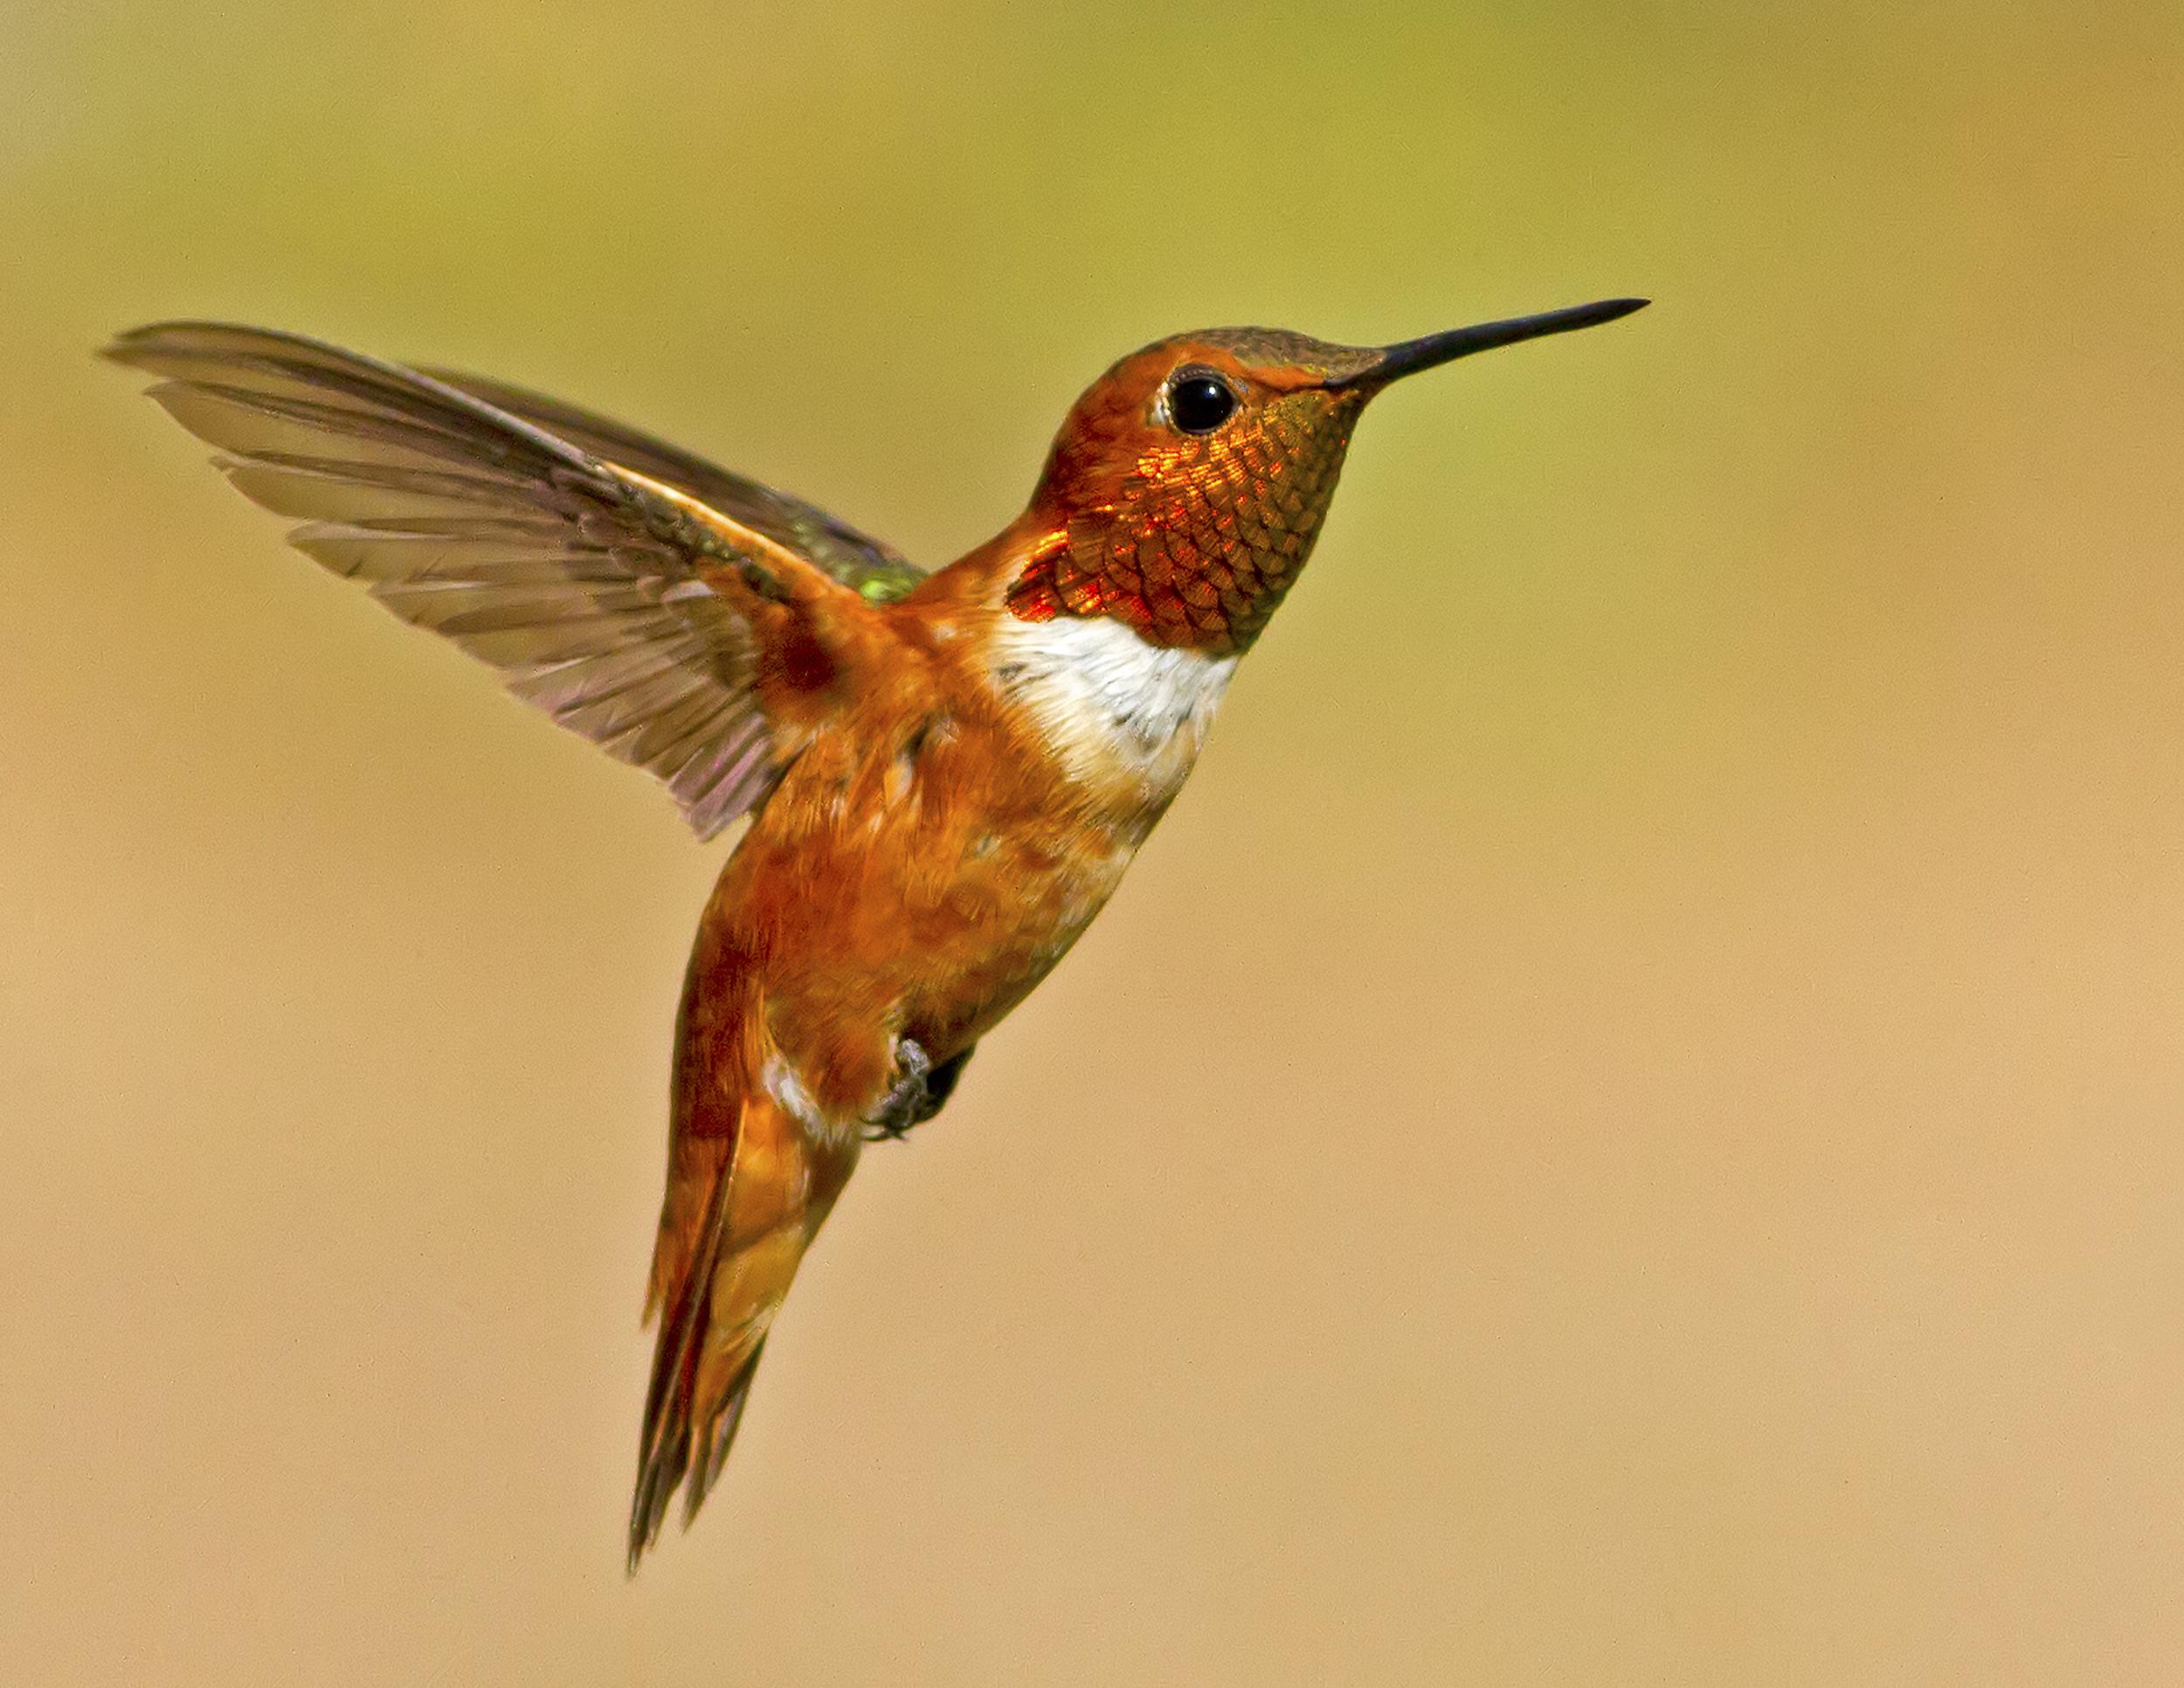 118 - Hummingbird